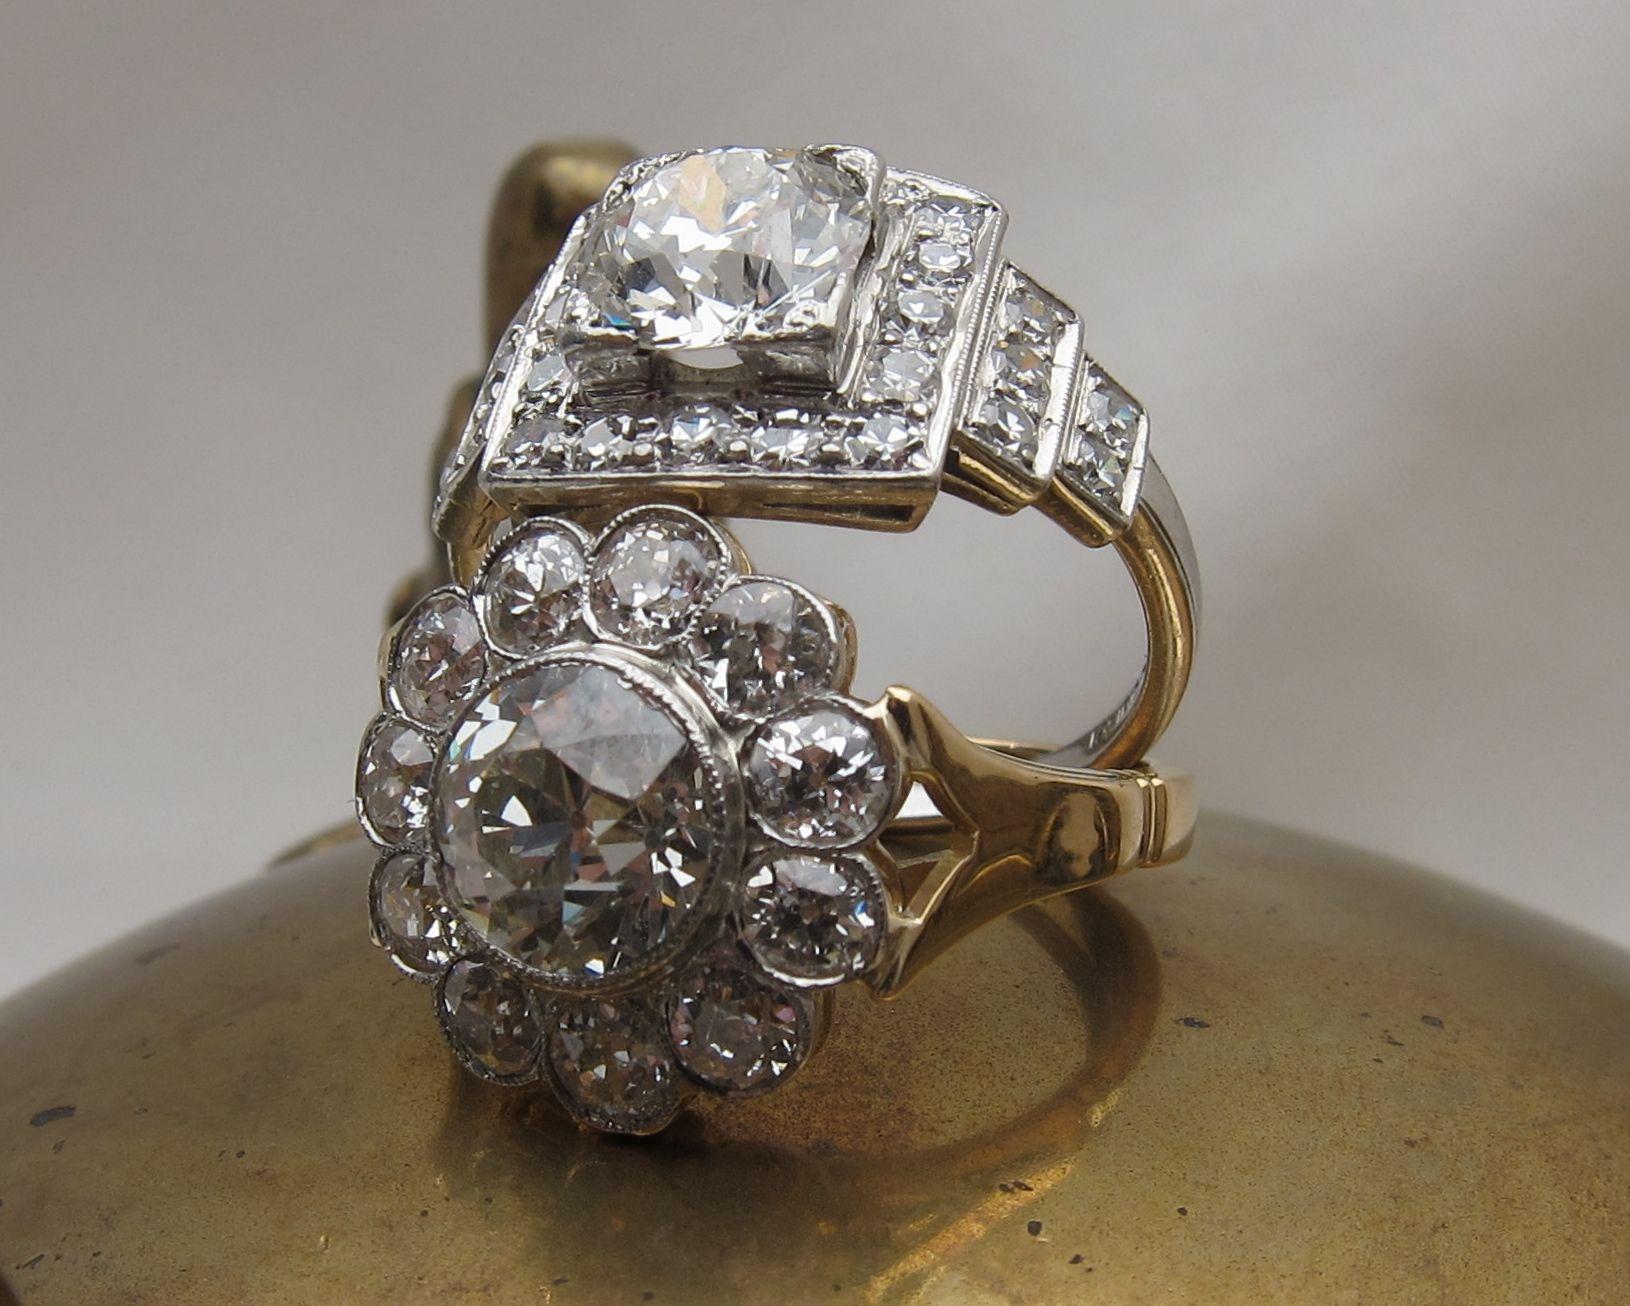 Vintage-Diamond-Engagement-Rings.jpg (1630×1306)